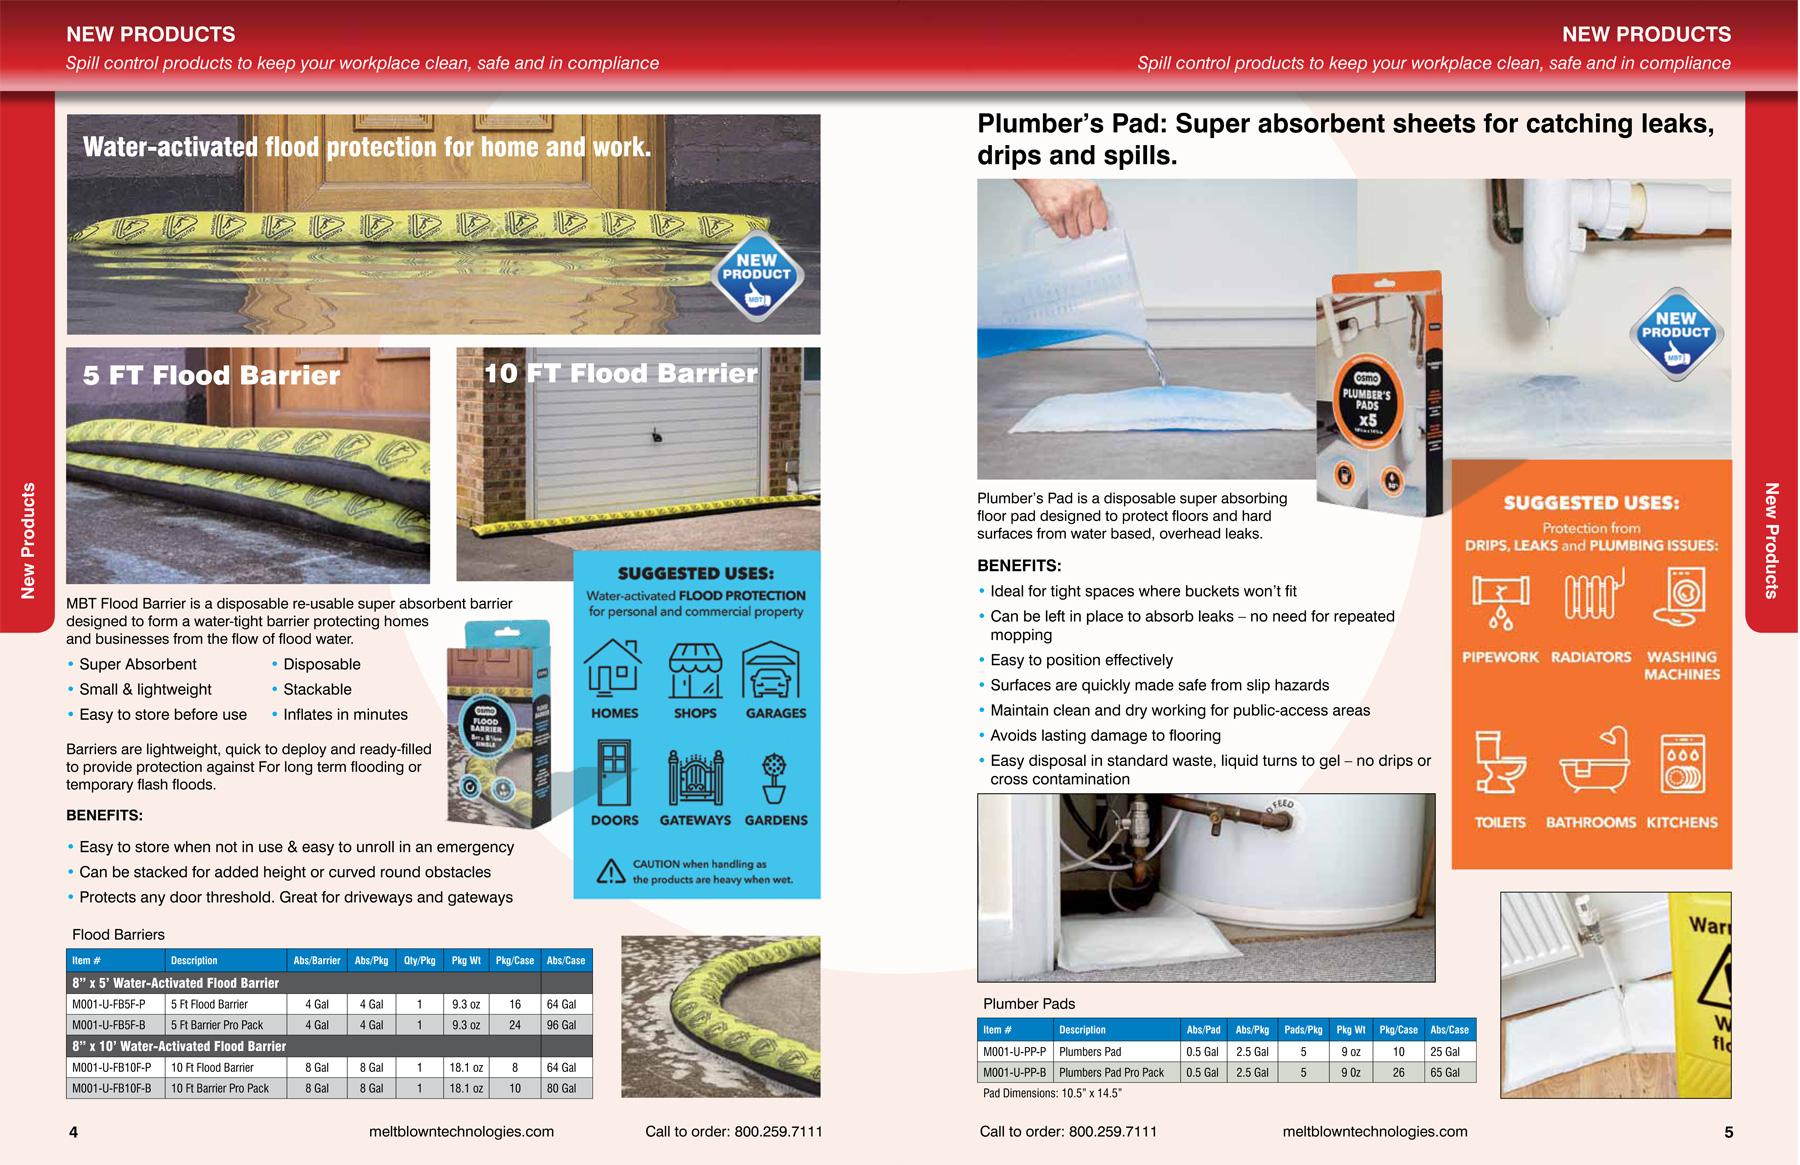 MBT product catalog